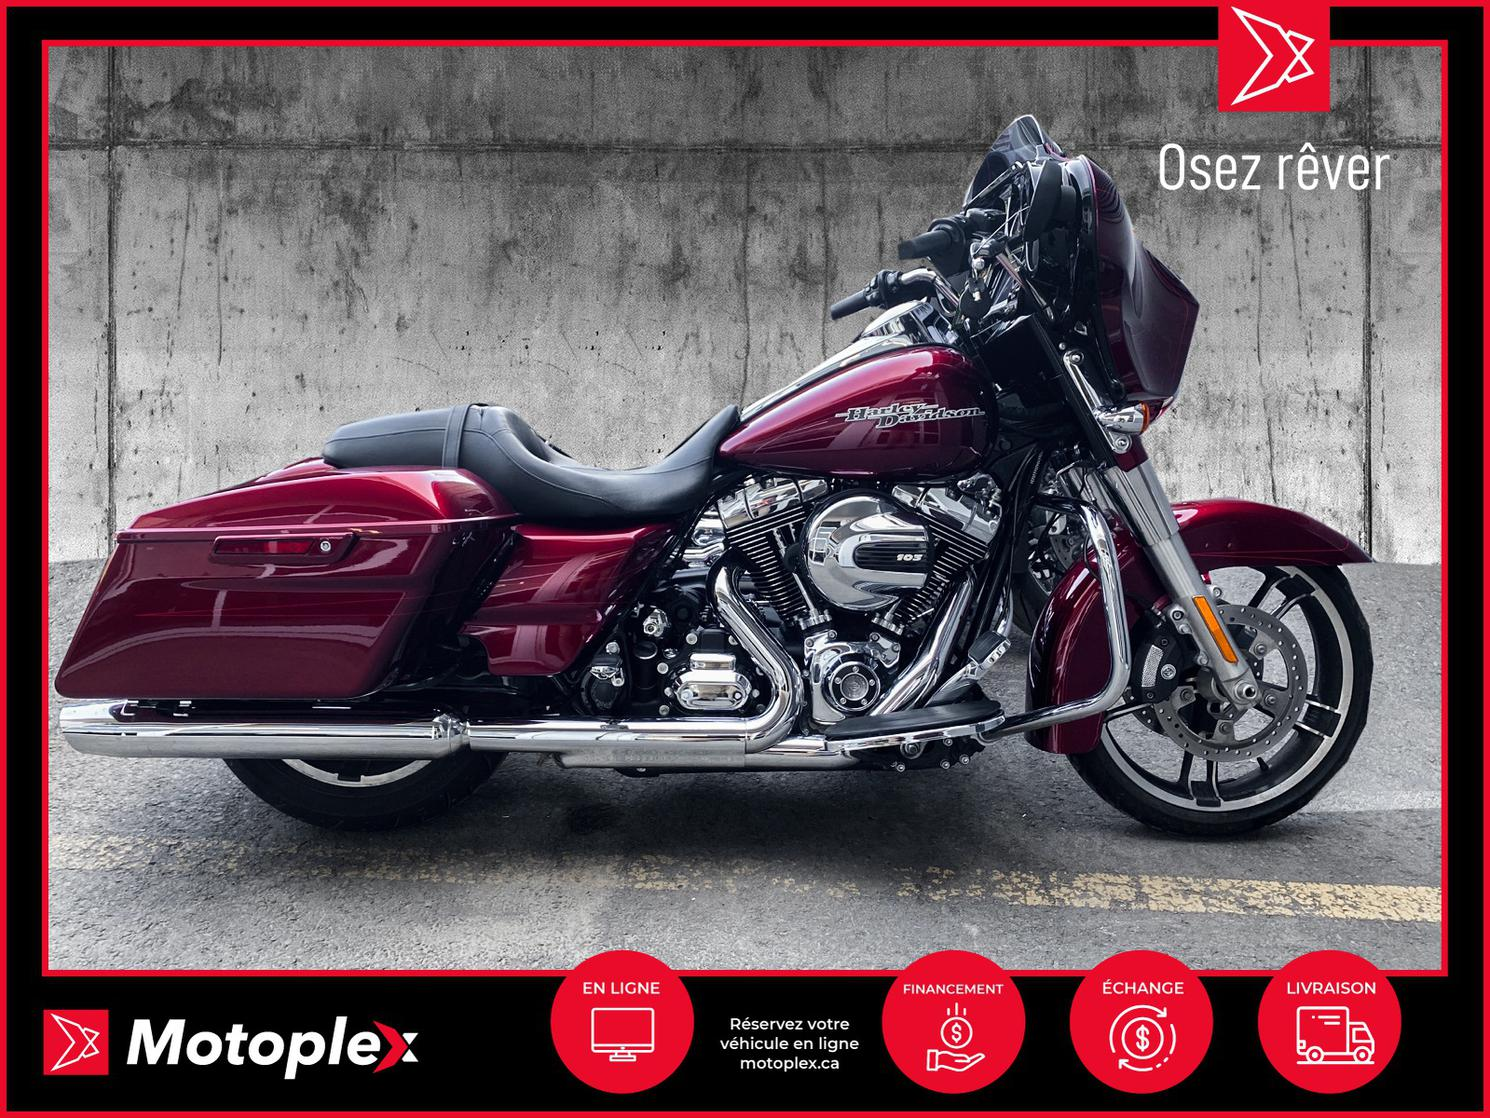 2016 Harley-Davidson STREET-GLIDE FLHXS 103 PC 68$/semaine